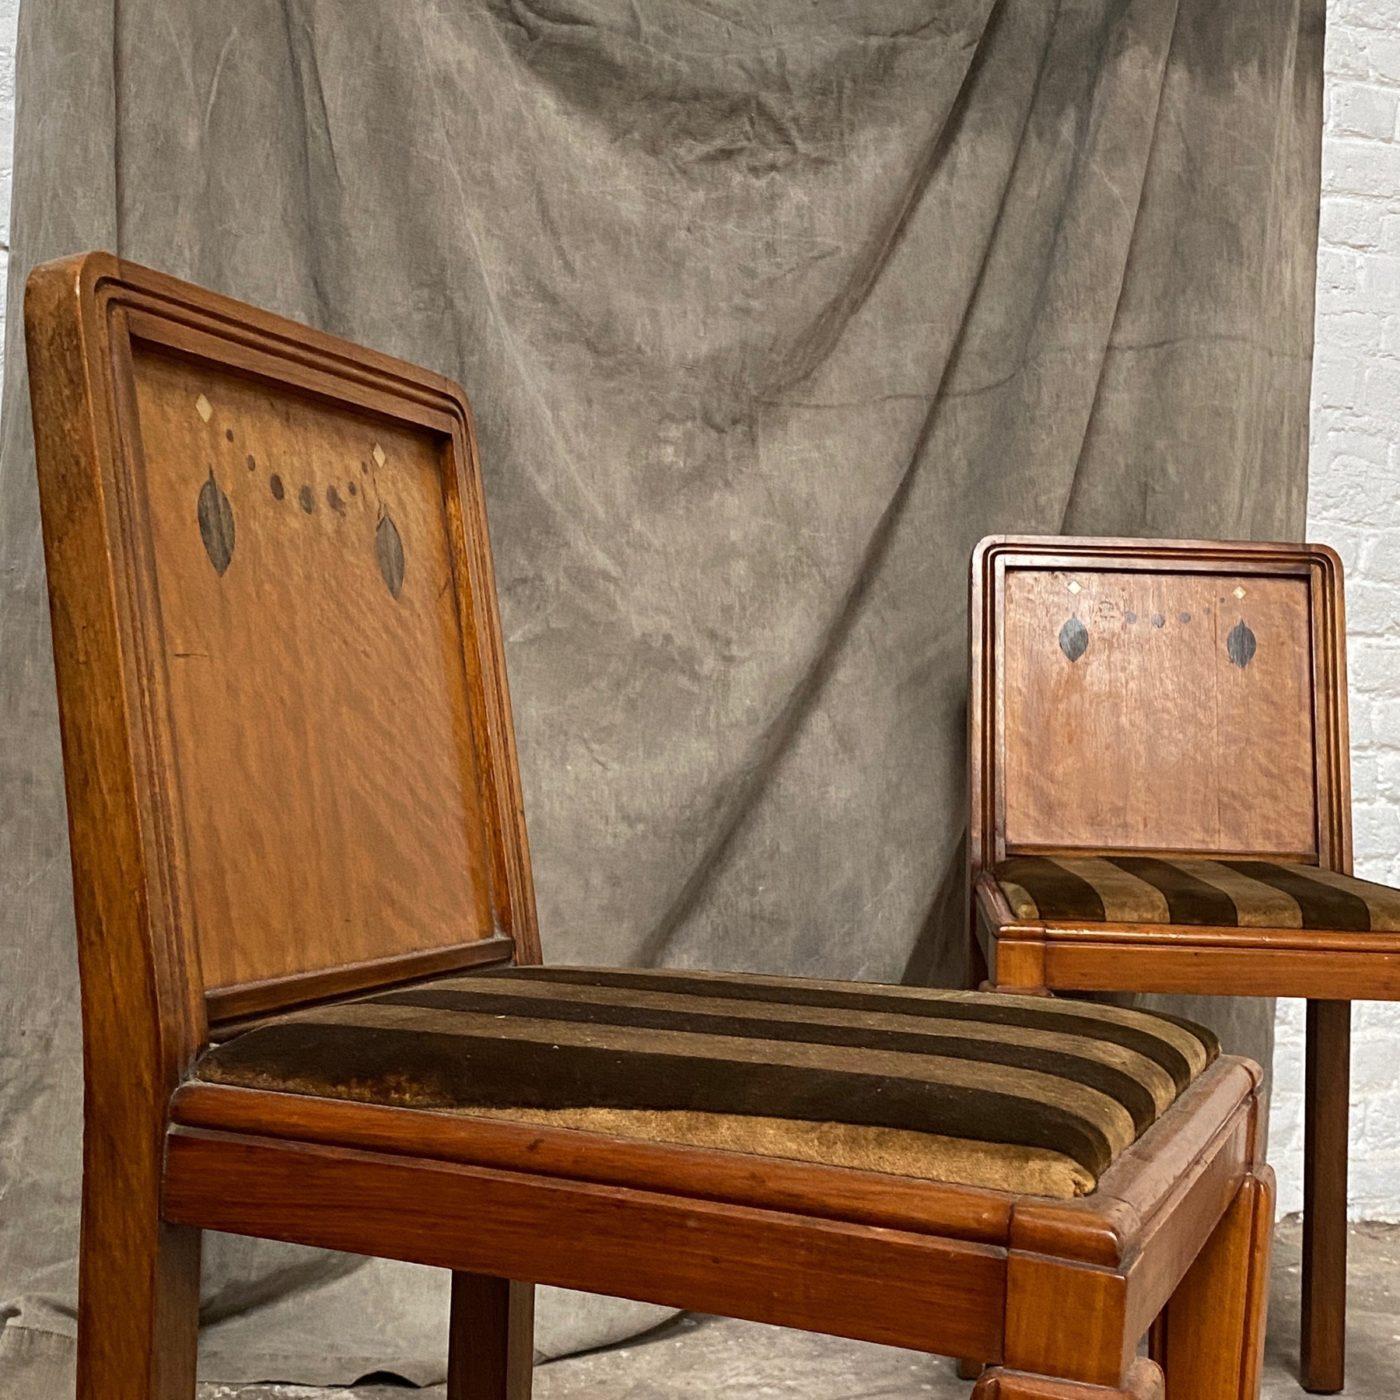 art-deco-chairs0003